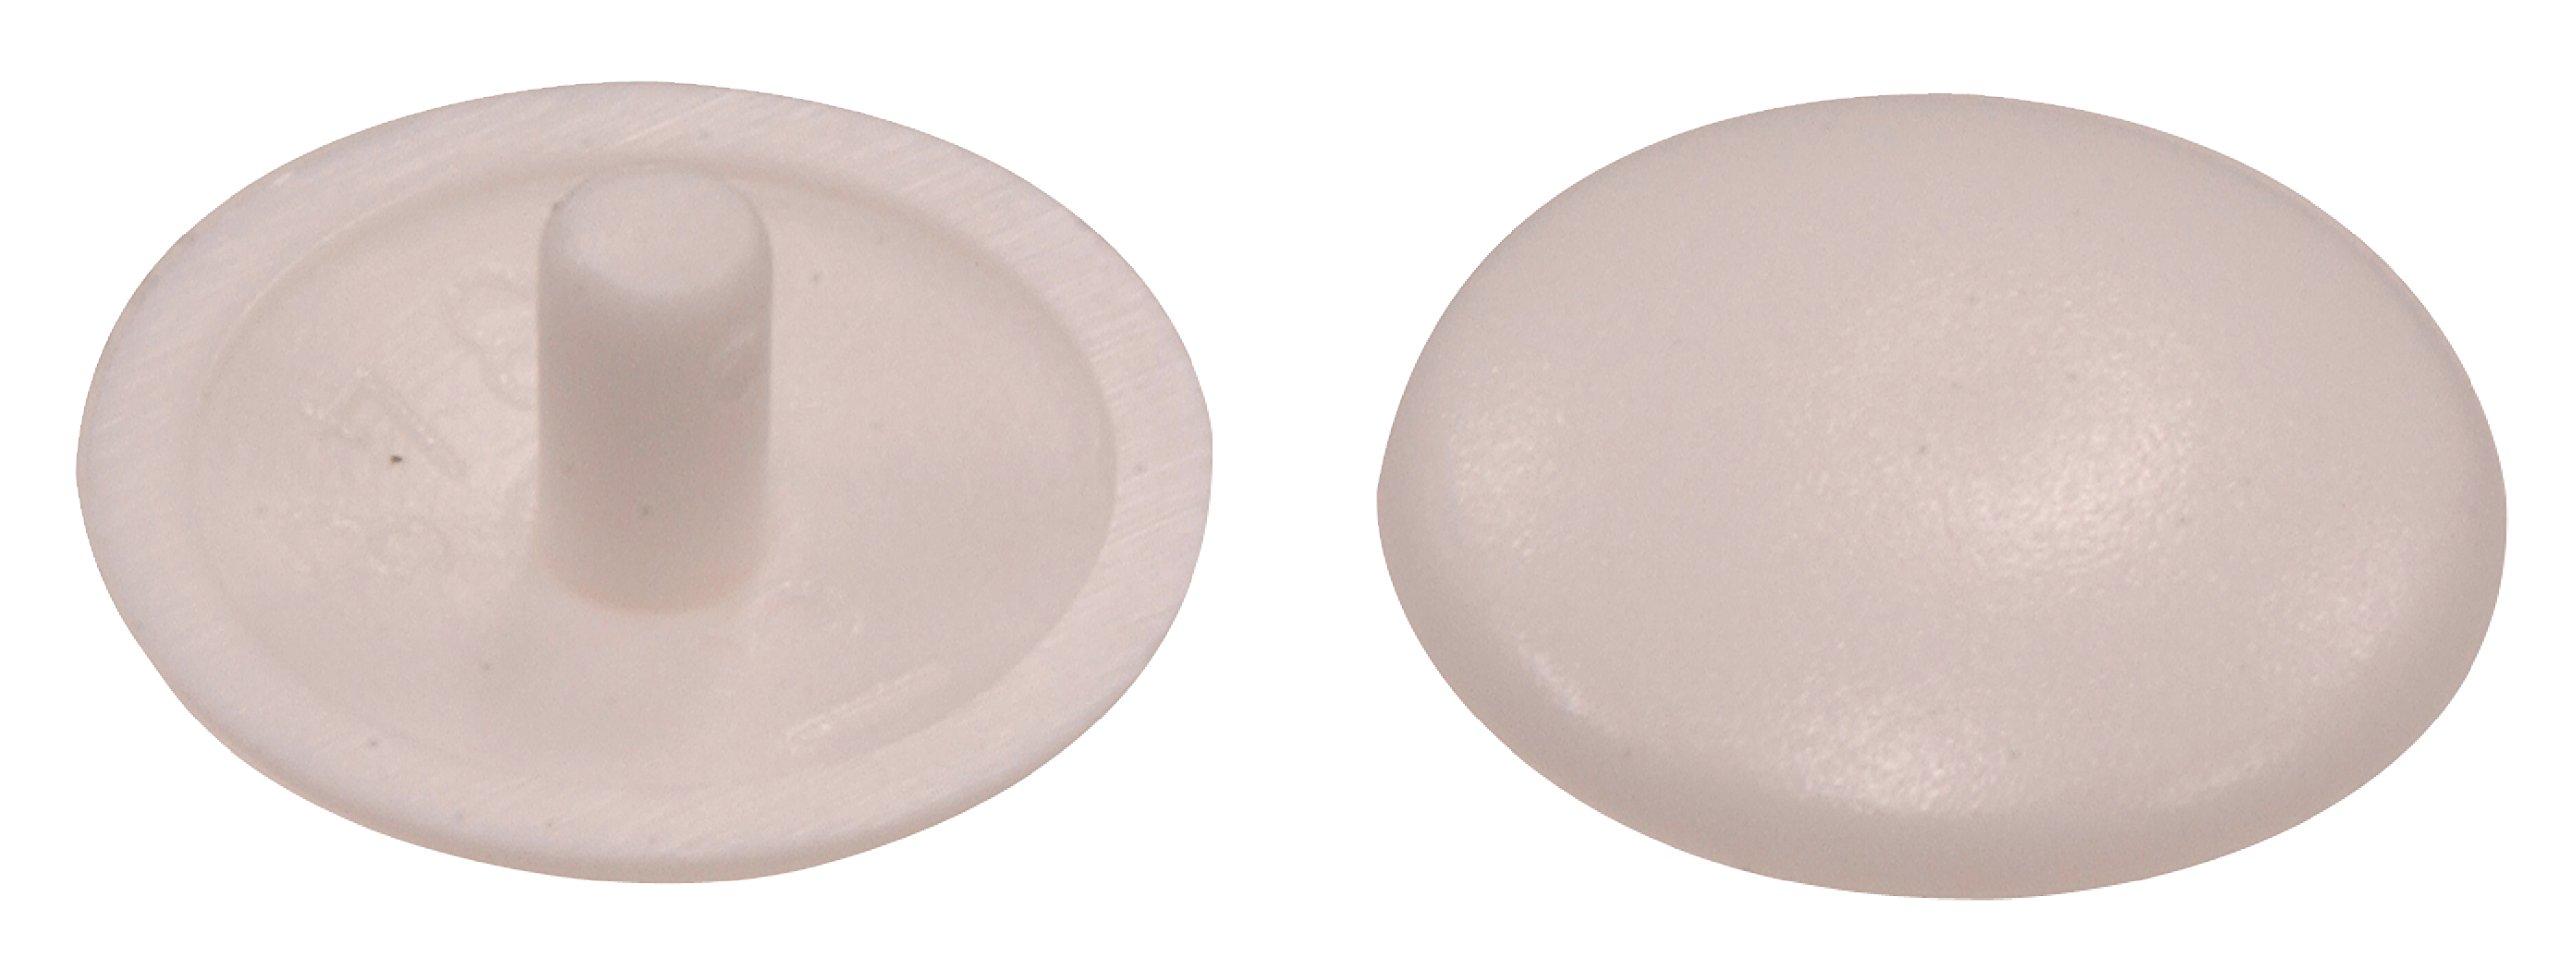 The Hillman Group 57213   Trim Caps, White, 25-Pack